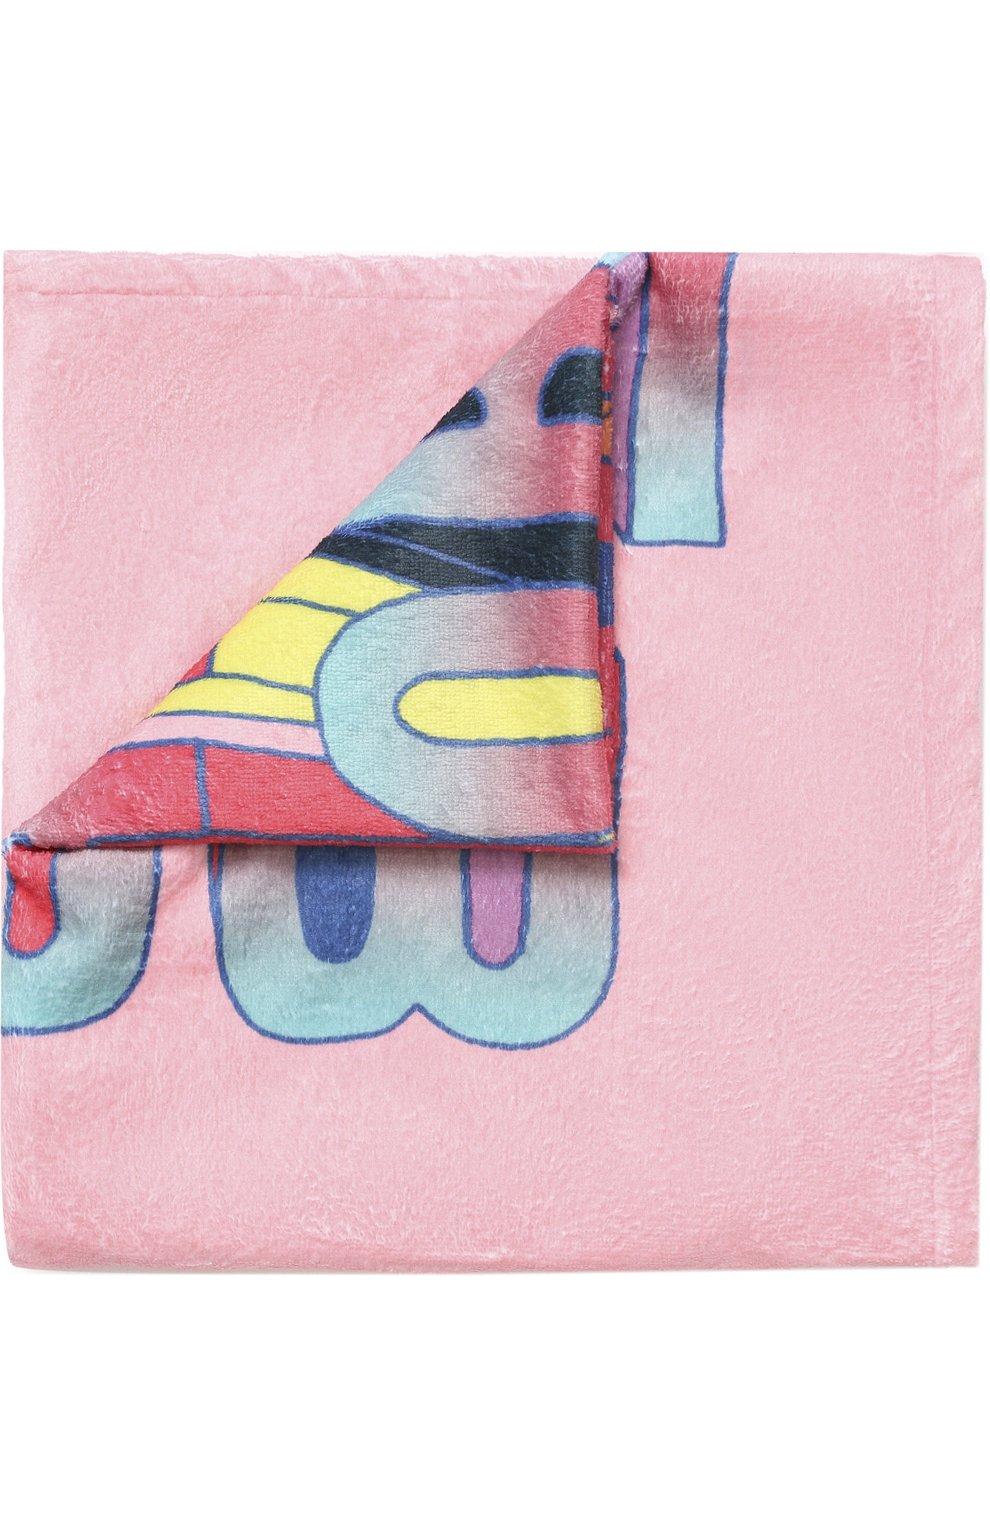 Детского пляжное полотенце с принтом MARC JACOBS (THE) розового цвета, арт. W10123 | Фото 1